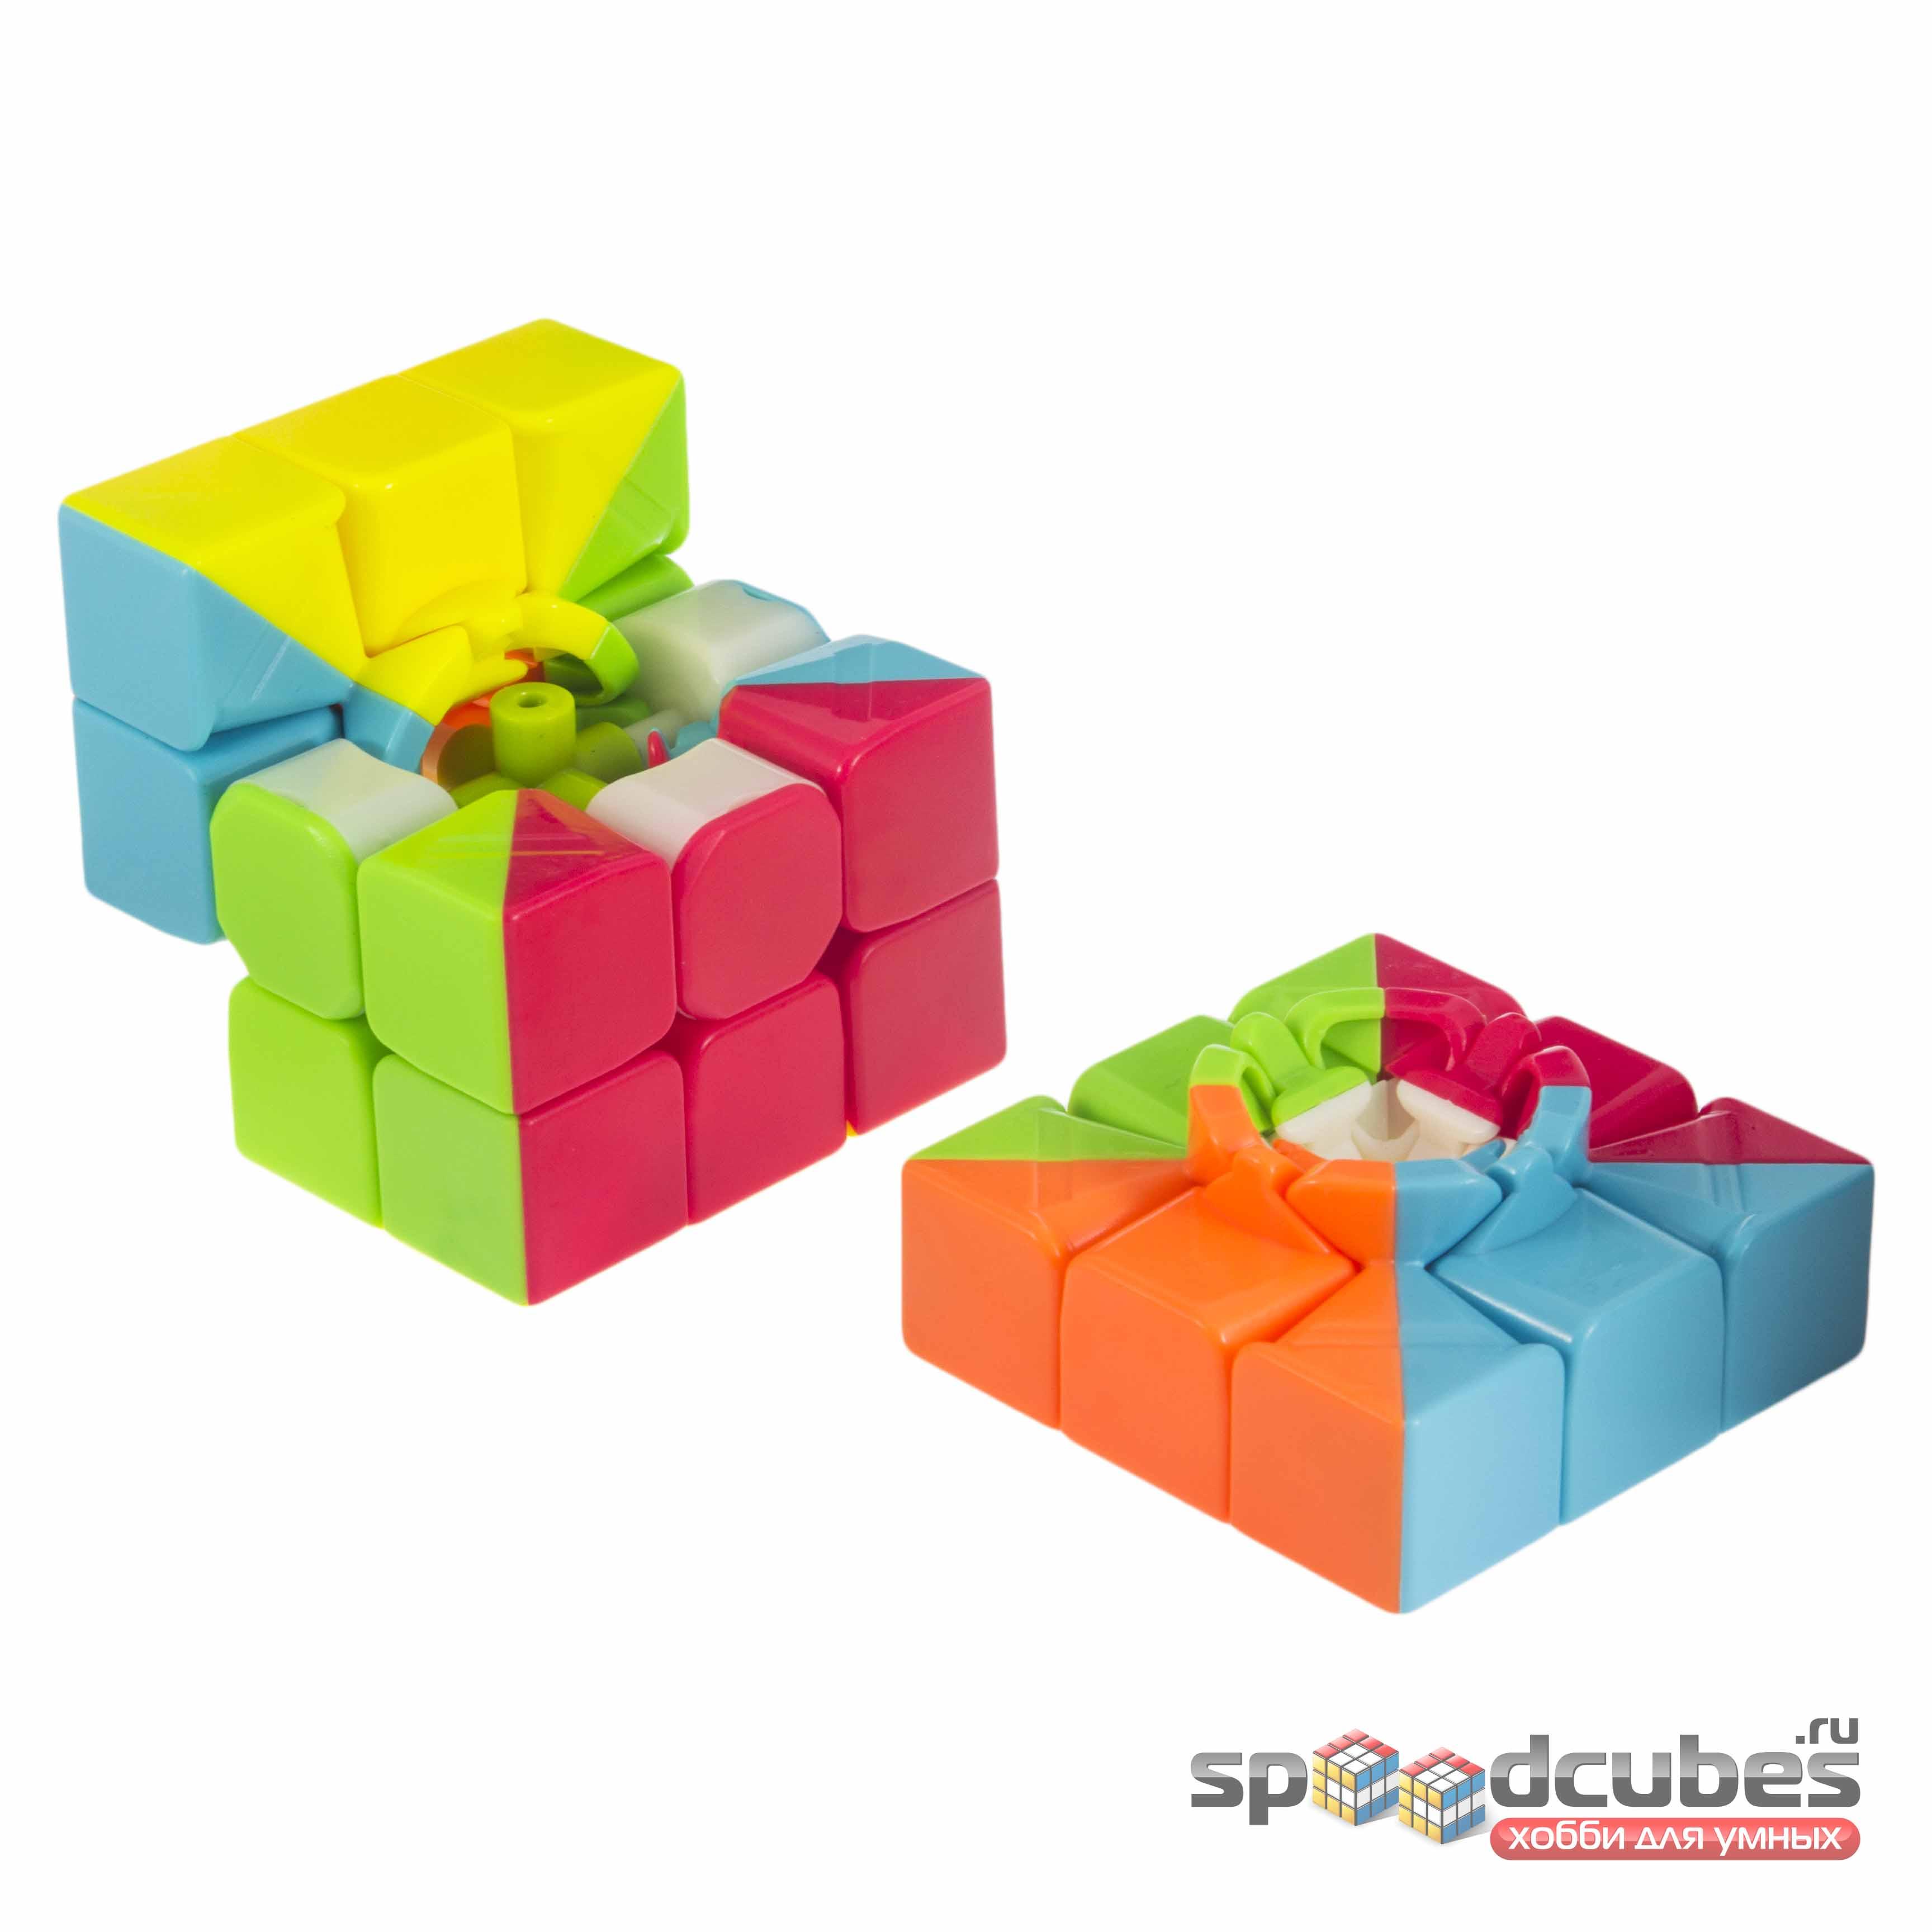 Qiyi Mofangge 3x3x3 Warrior W Color 4